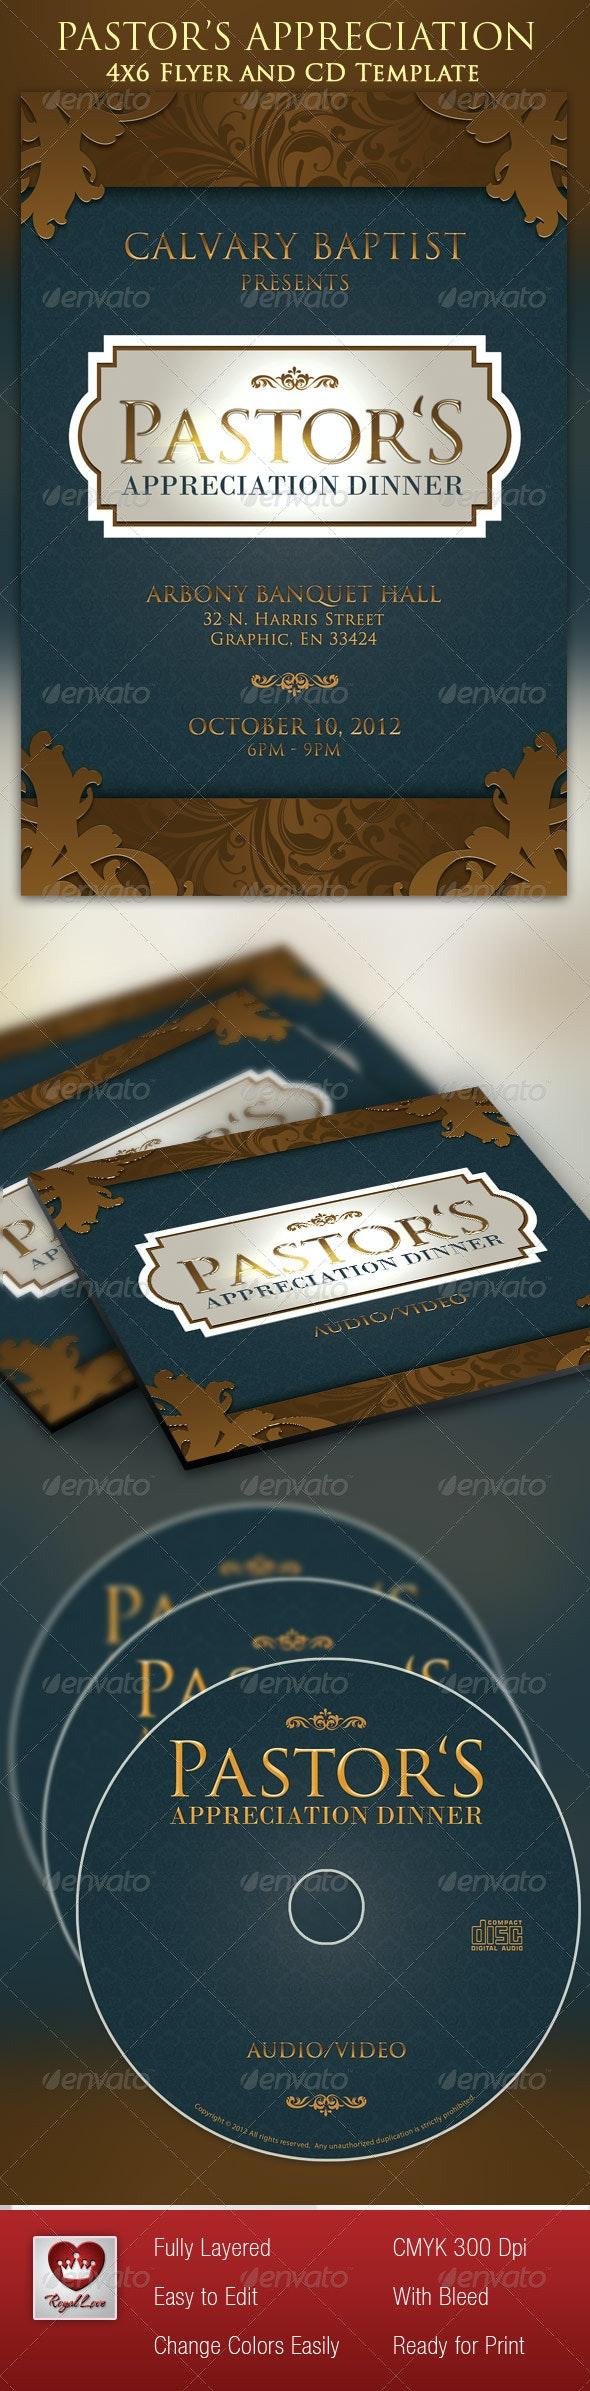 Pastor's Appreciation Dinner Church Flyer and CD  - Church Flyers